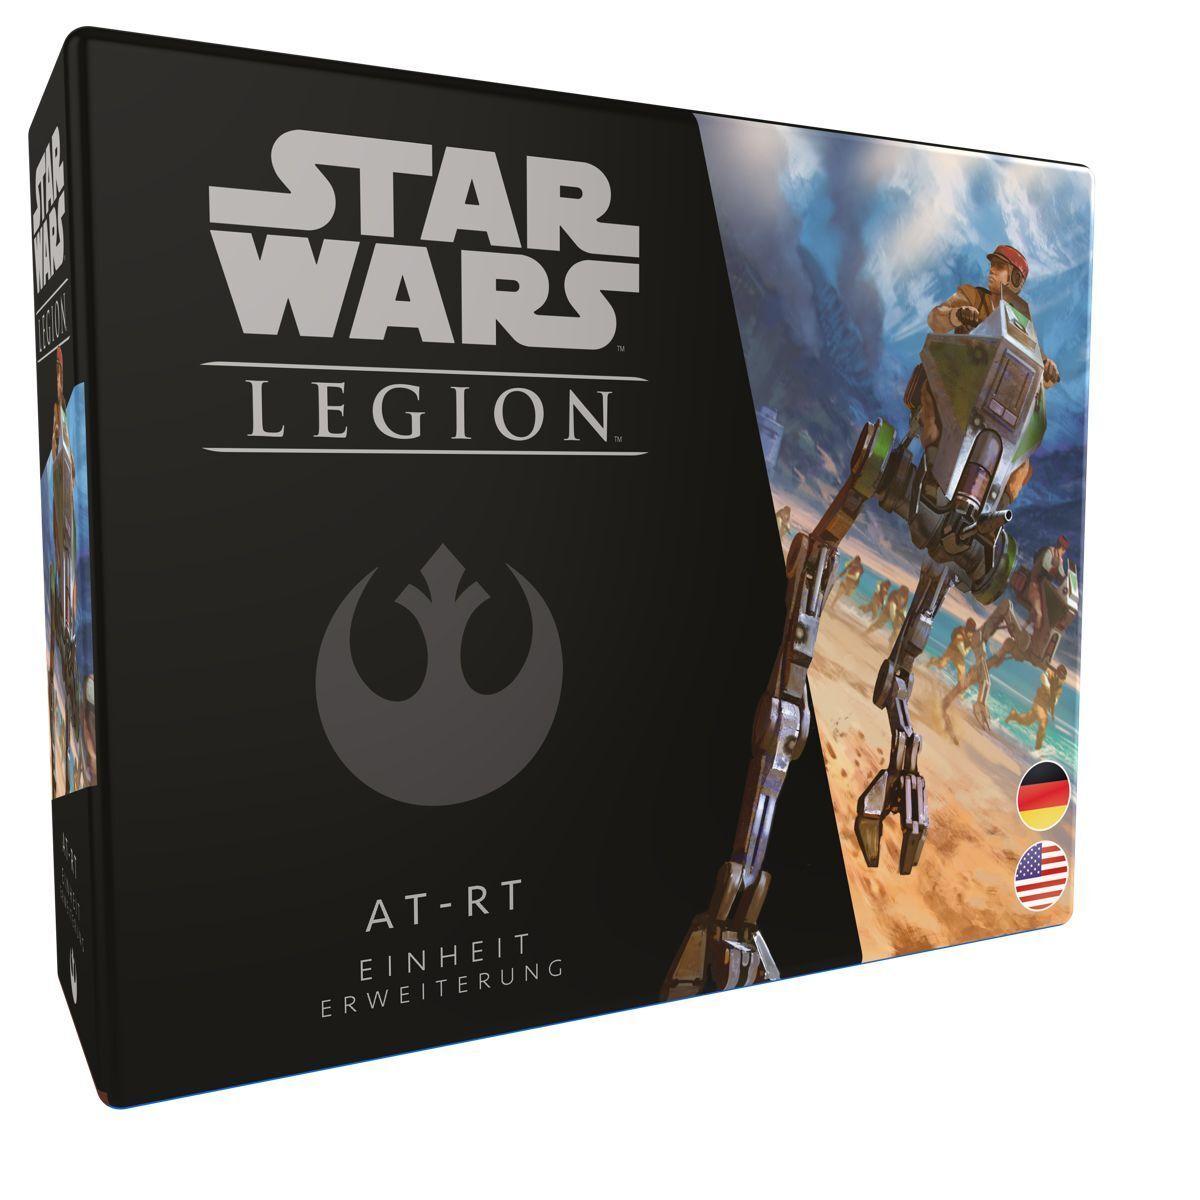 Star Wars Legion AT-RT Extension (German   English) FFG Rebels Legions